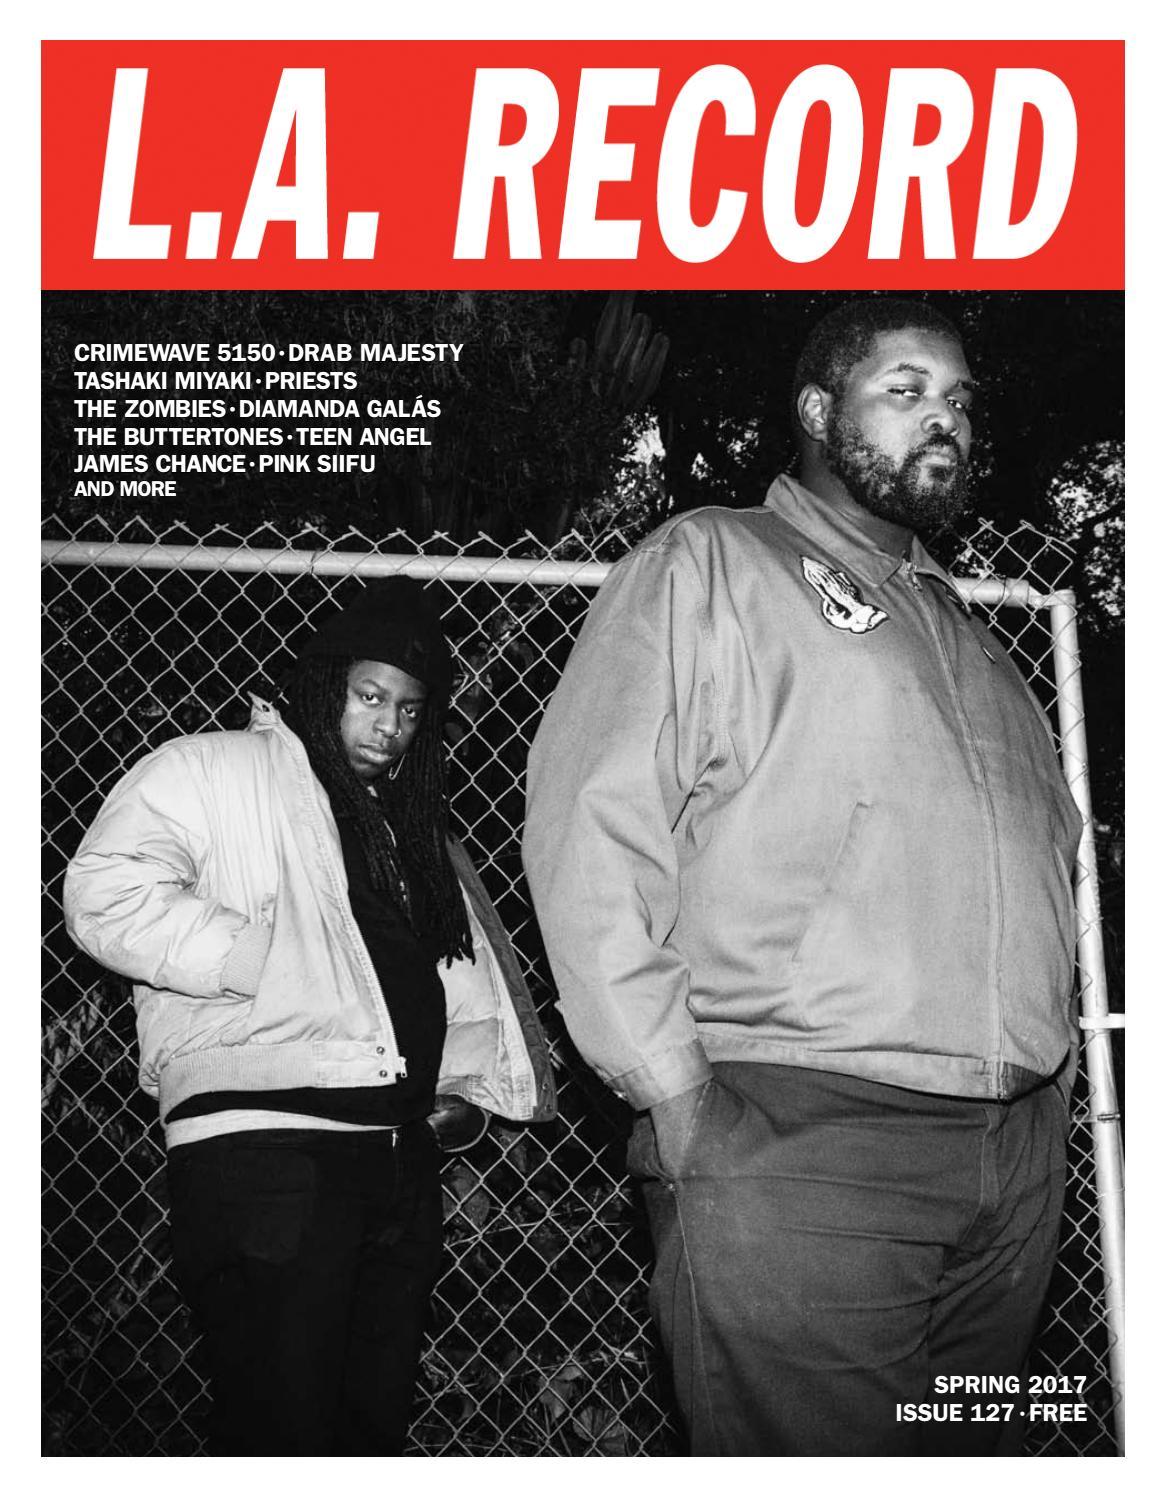 5ff4b2c27f3e L.A. RECORD ISSUE 127 by L.A. RECORD - issuu